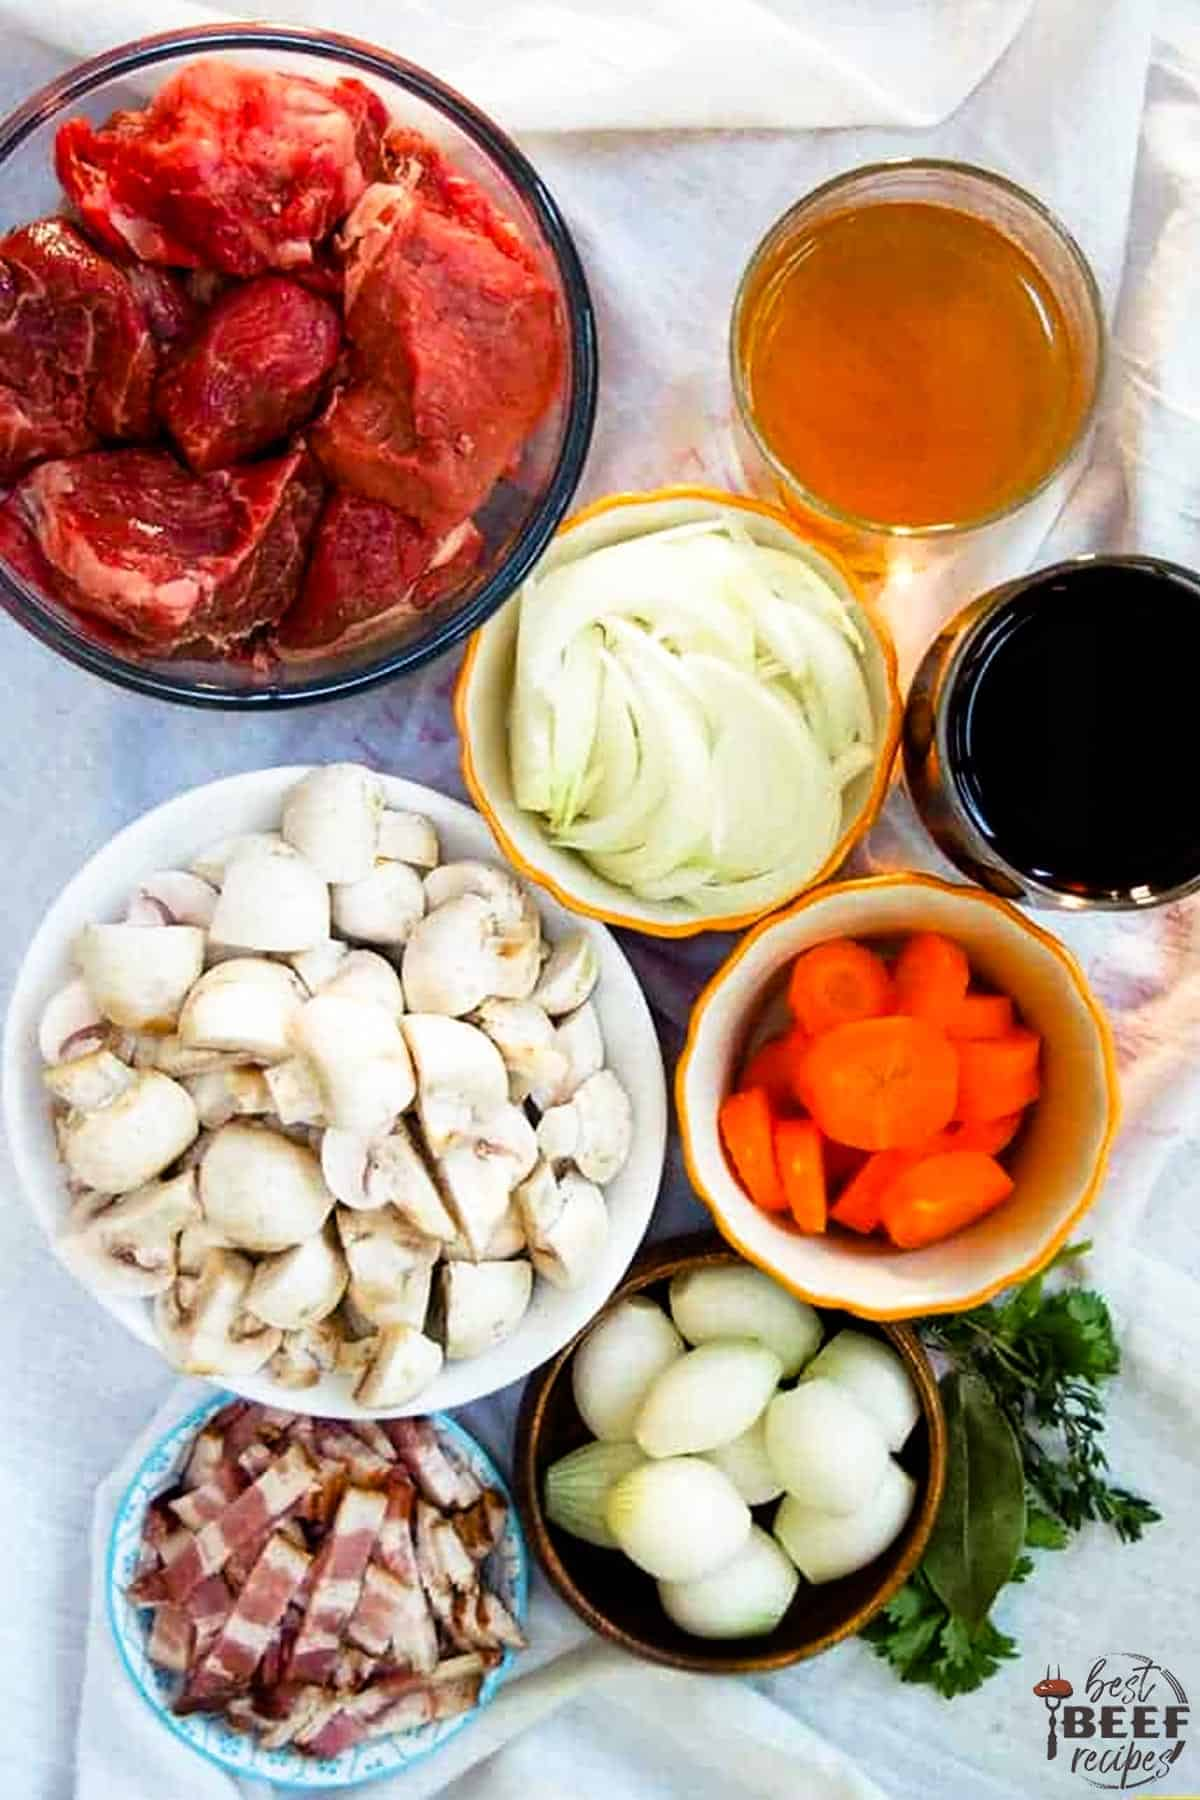 Ingredients for beef bourguignon